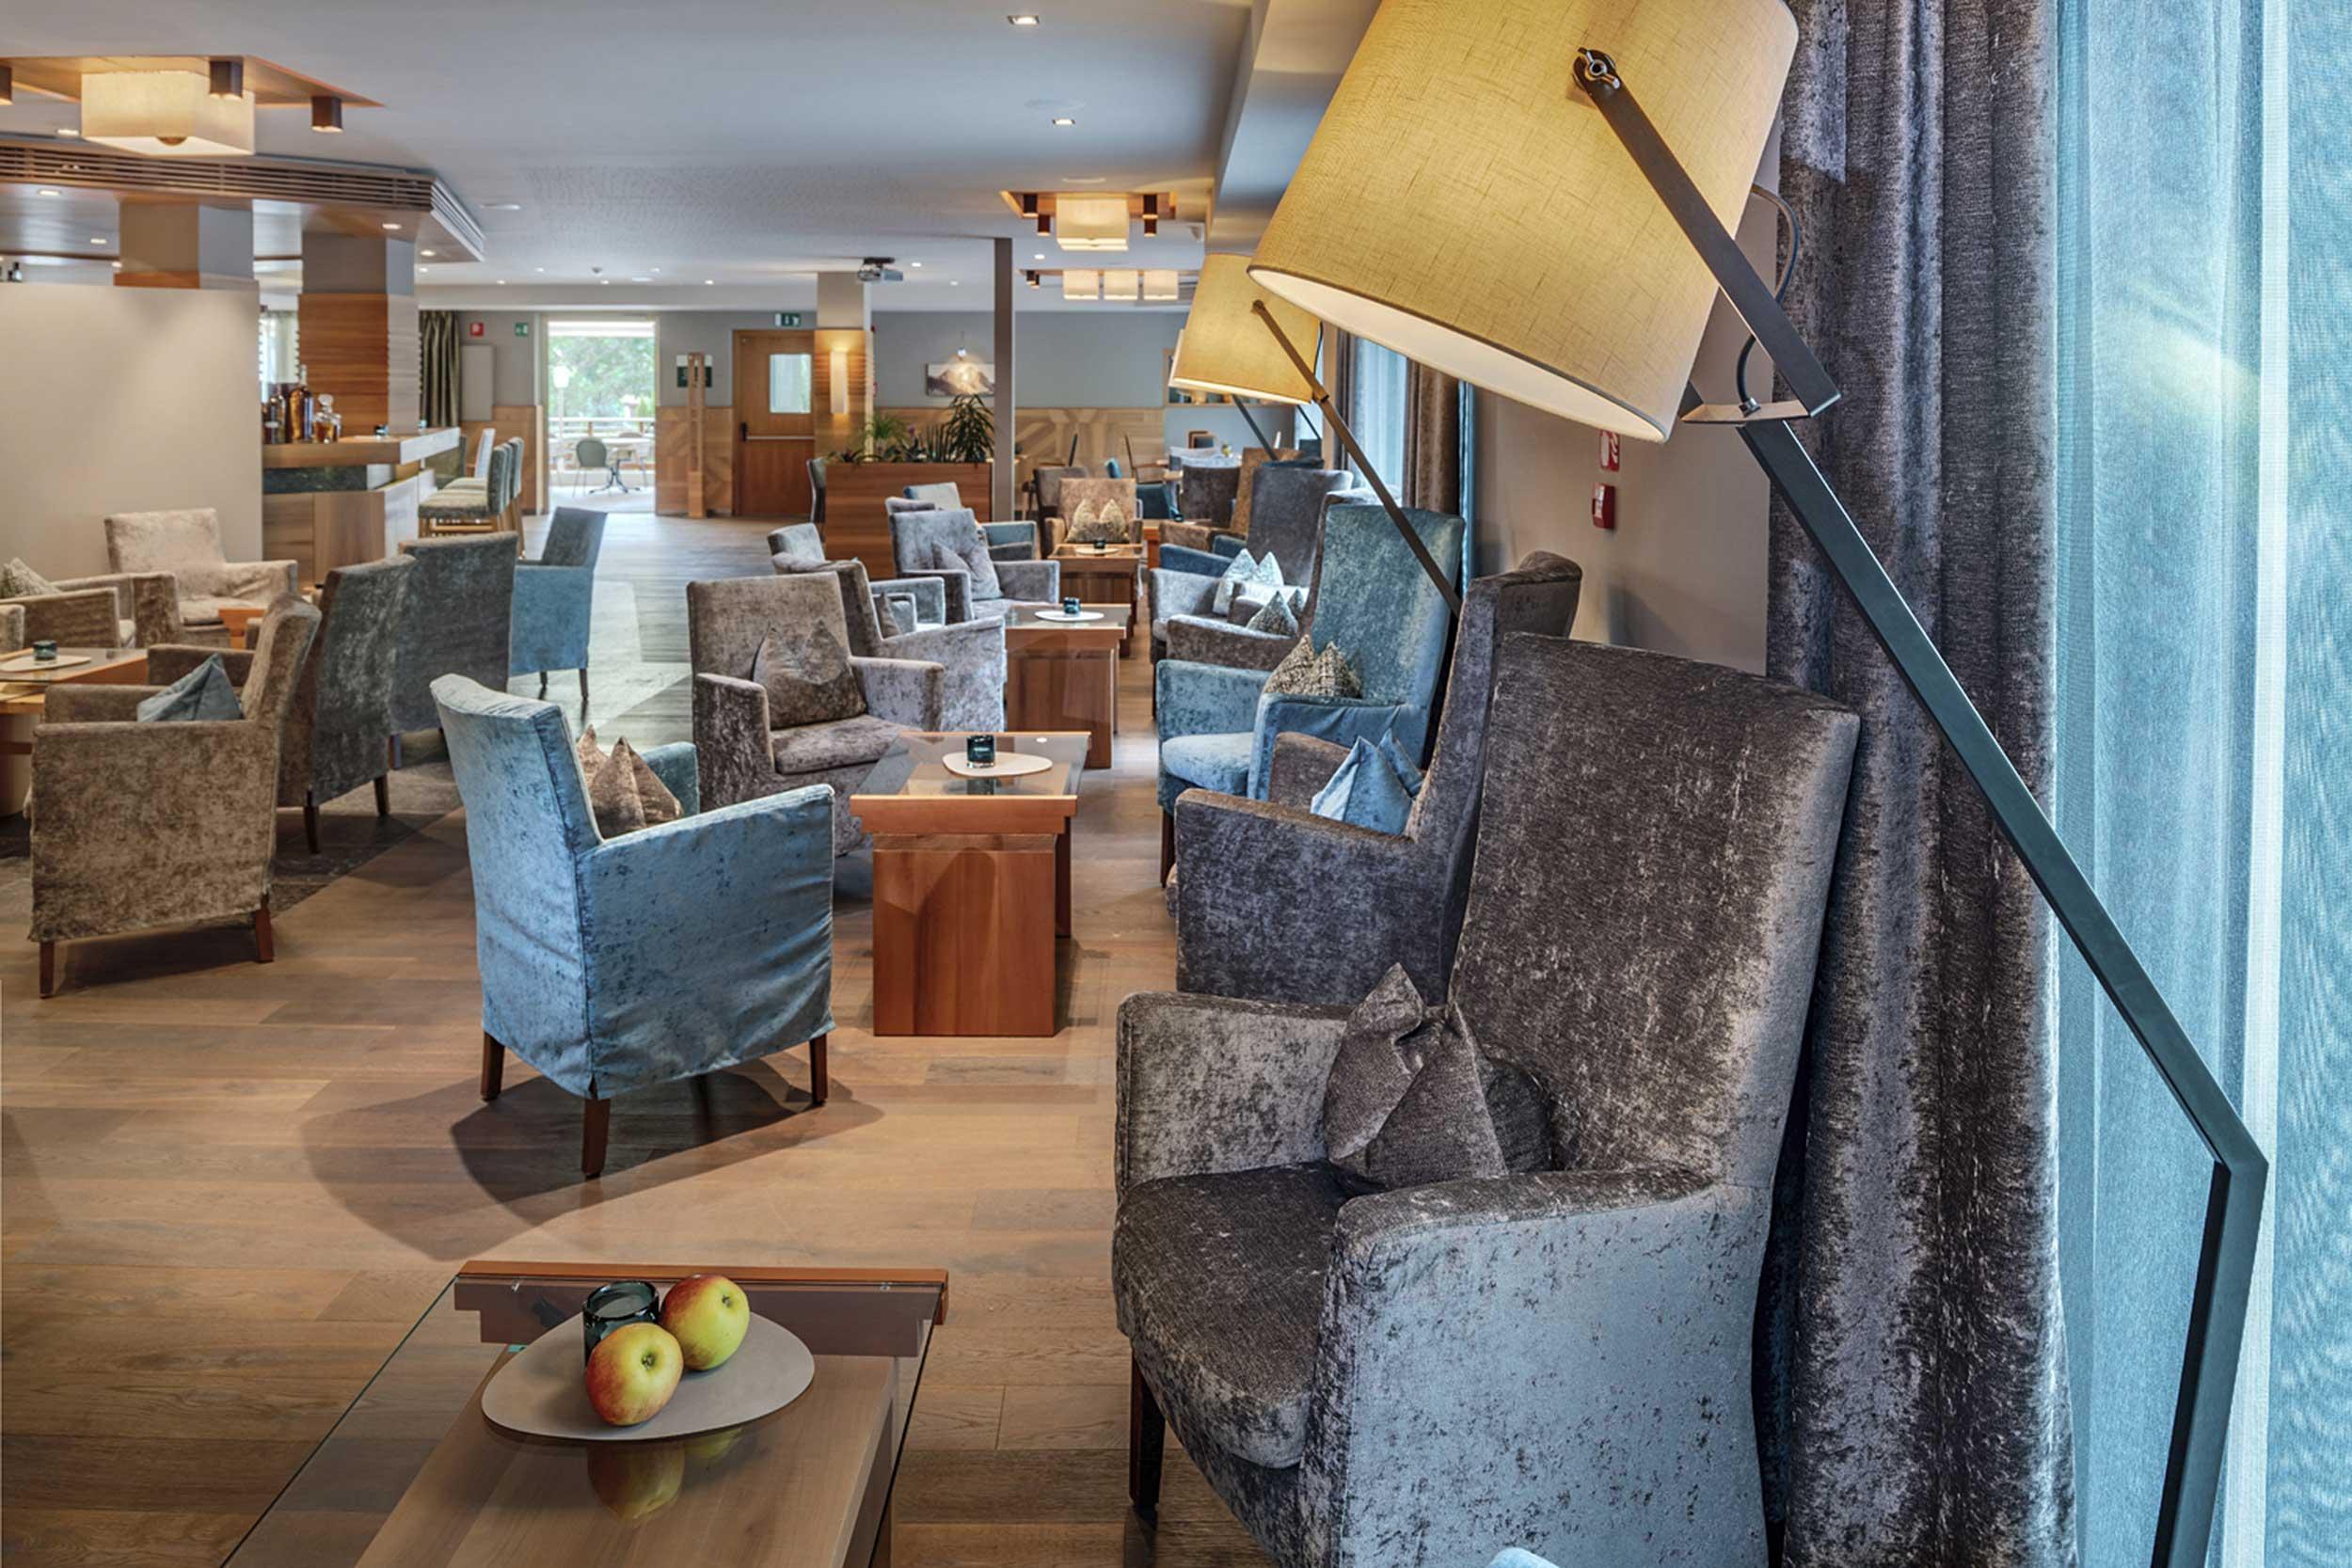 Hotel Waldhof - Rabland bei Mersraum